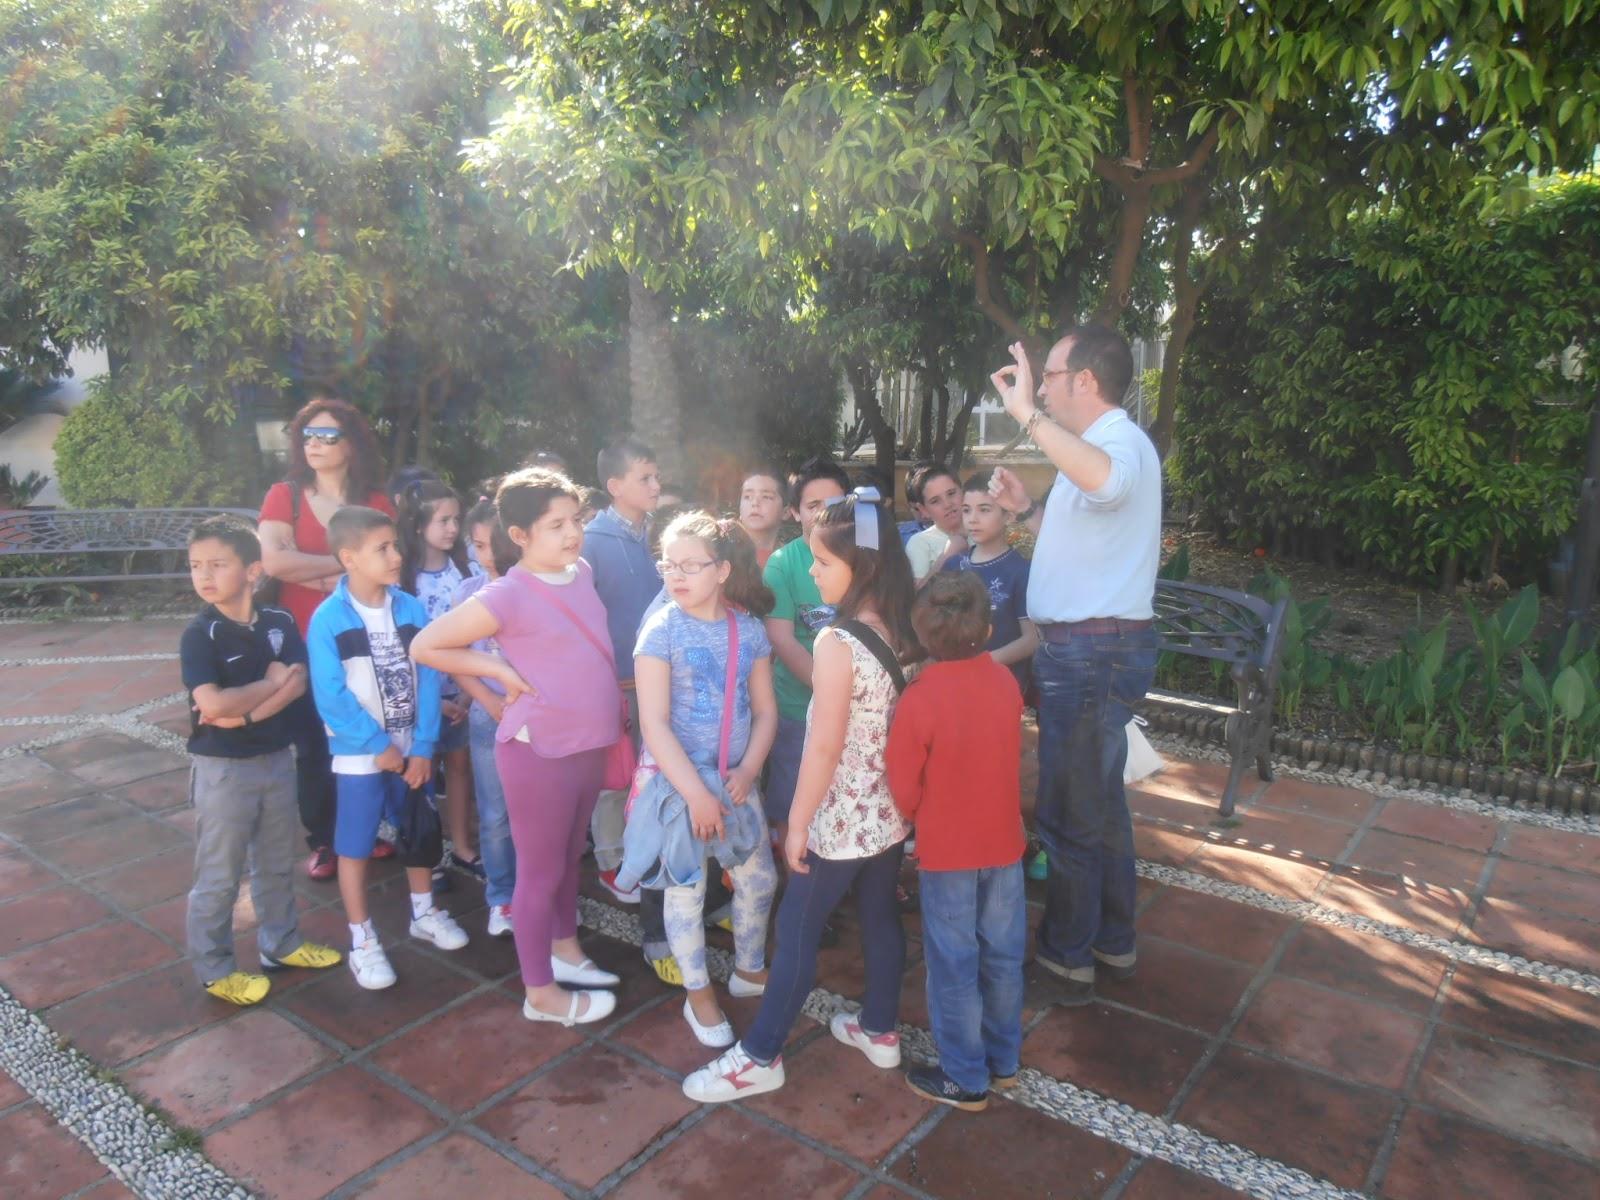 Ceip andaluc a c rdoba primer ciclo 12 13 en el jard n for Ceip jardin botanico